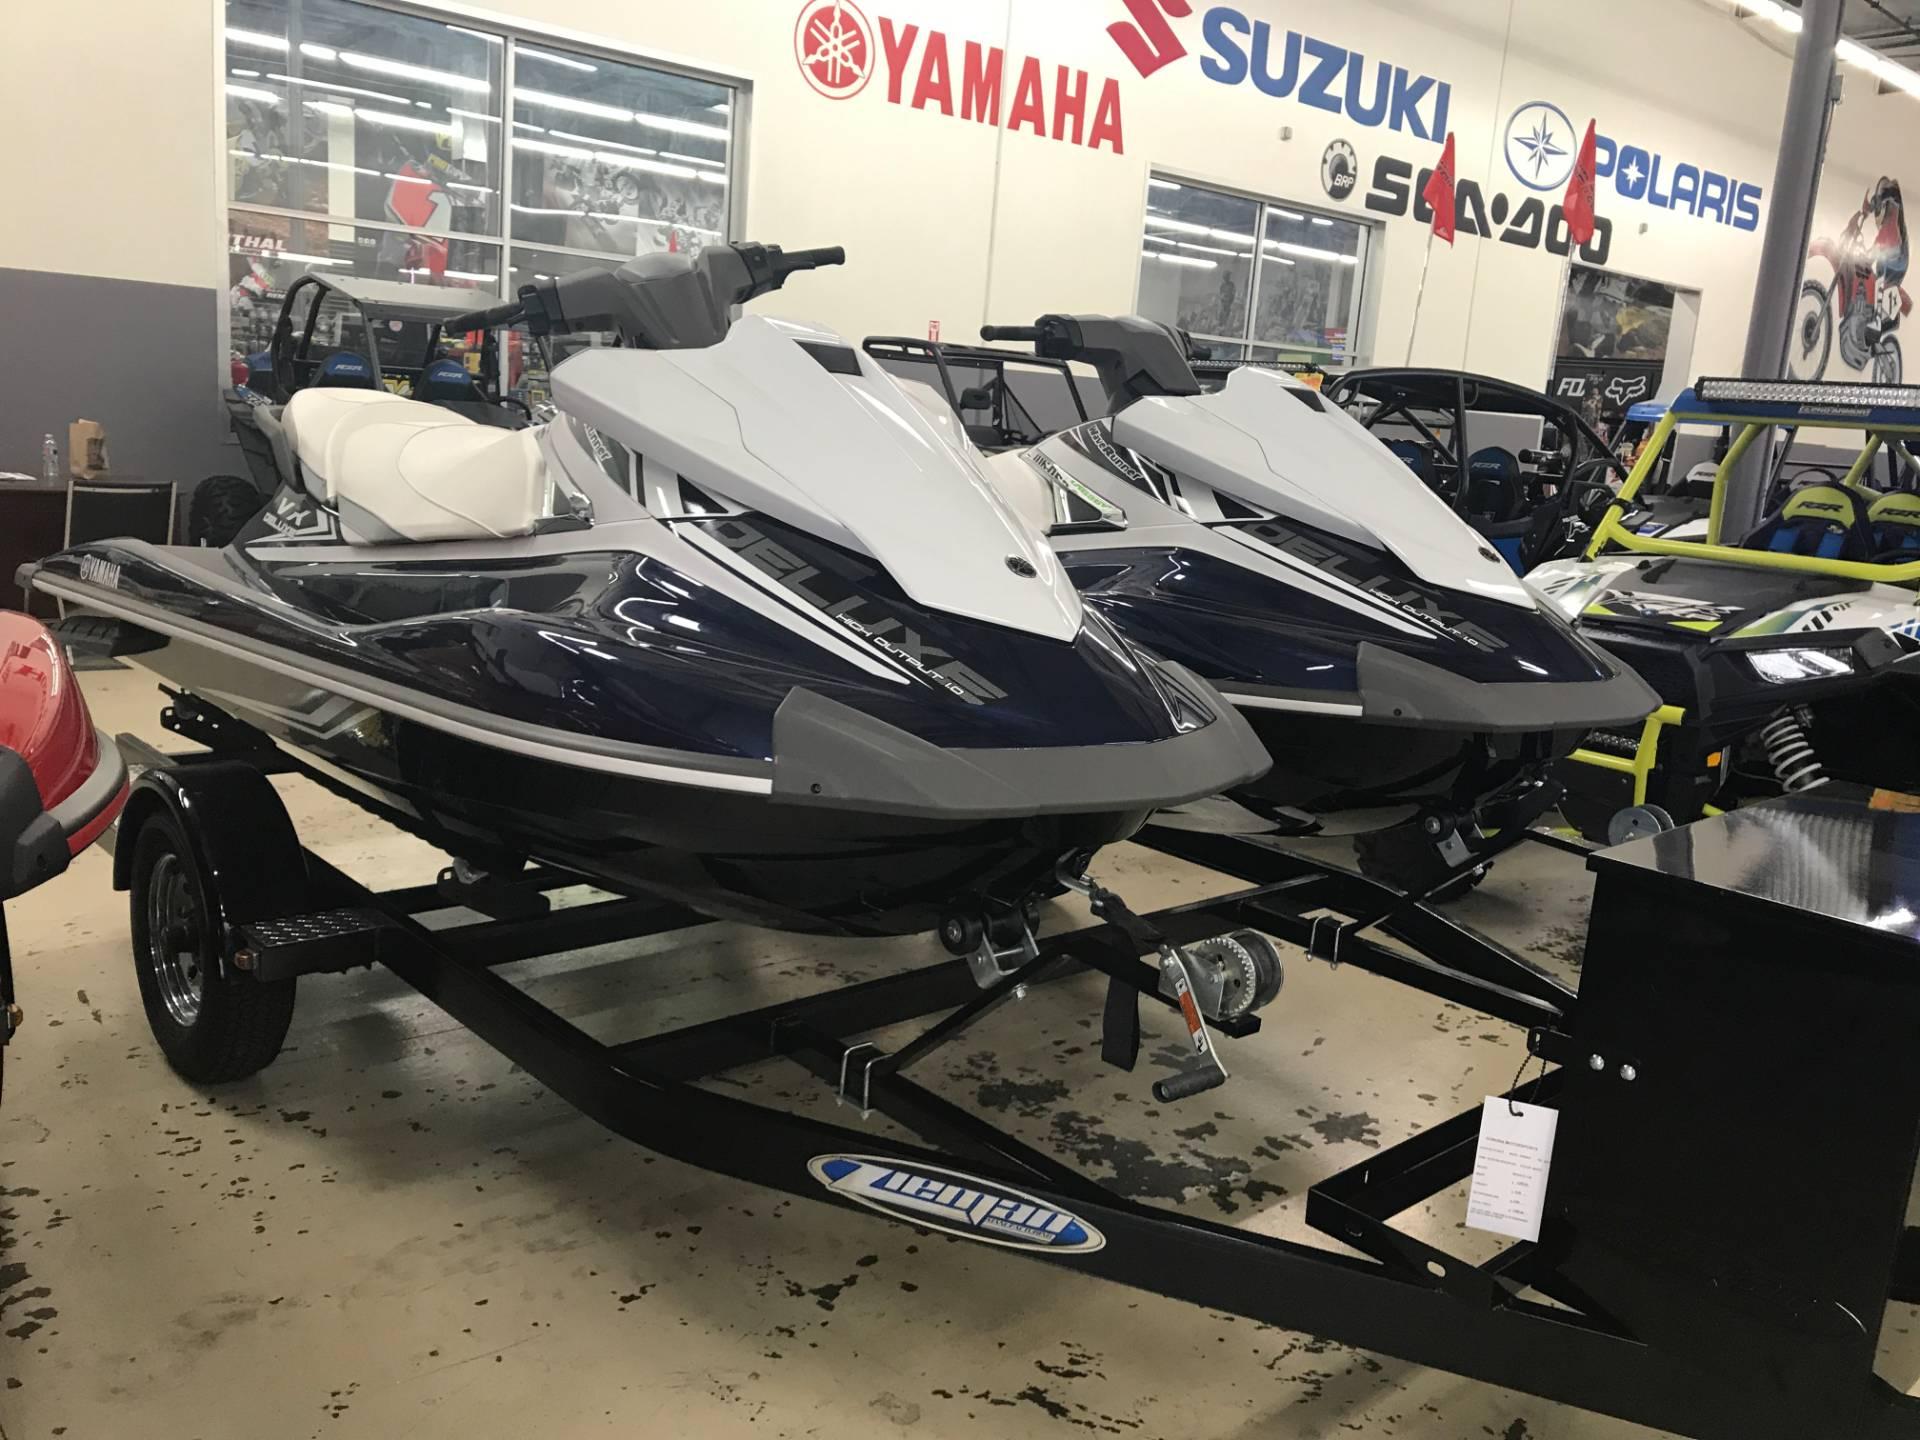 2016 Yamaha VX Deluxe 3